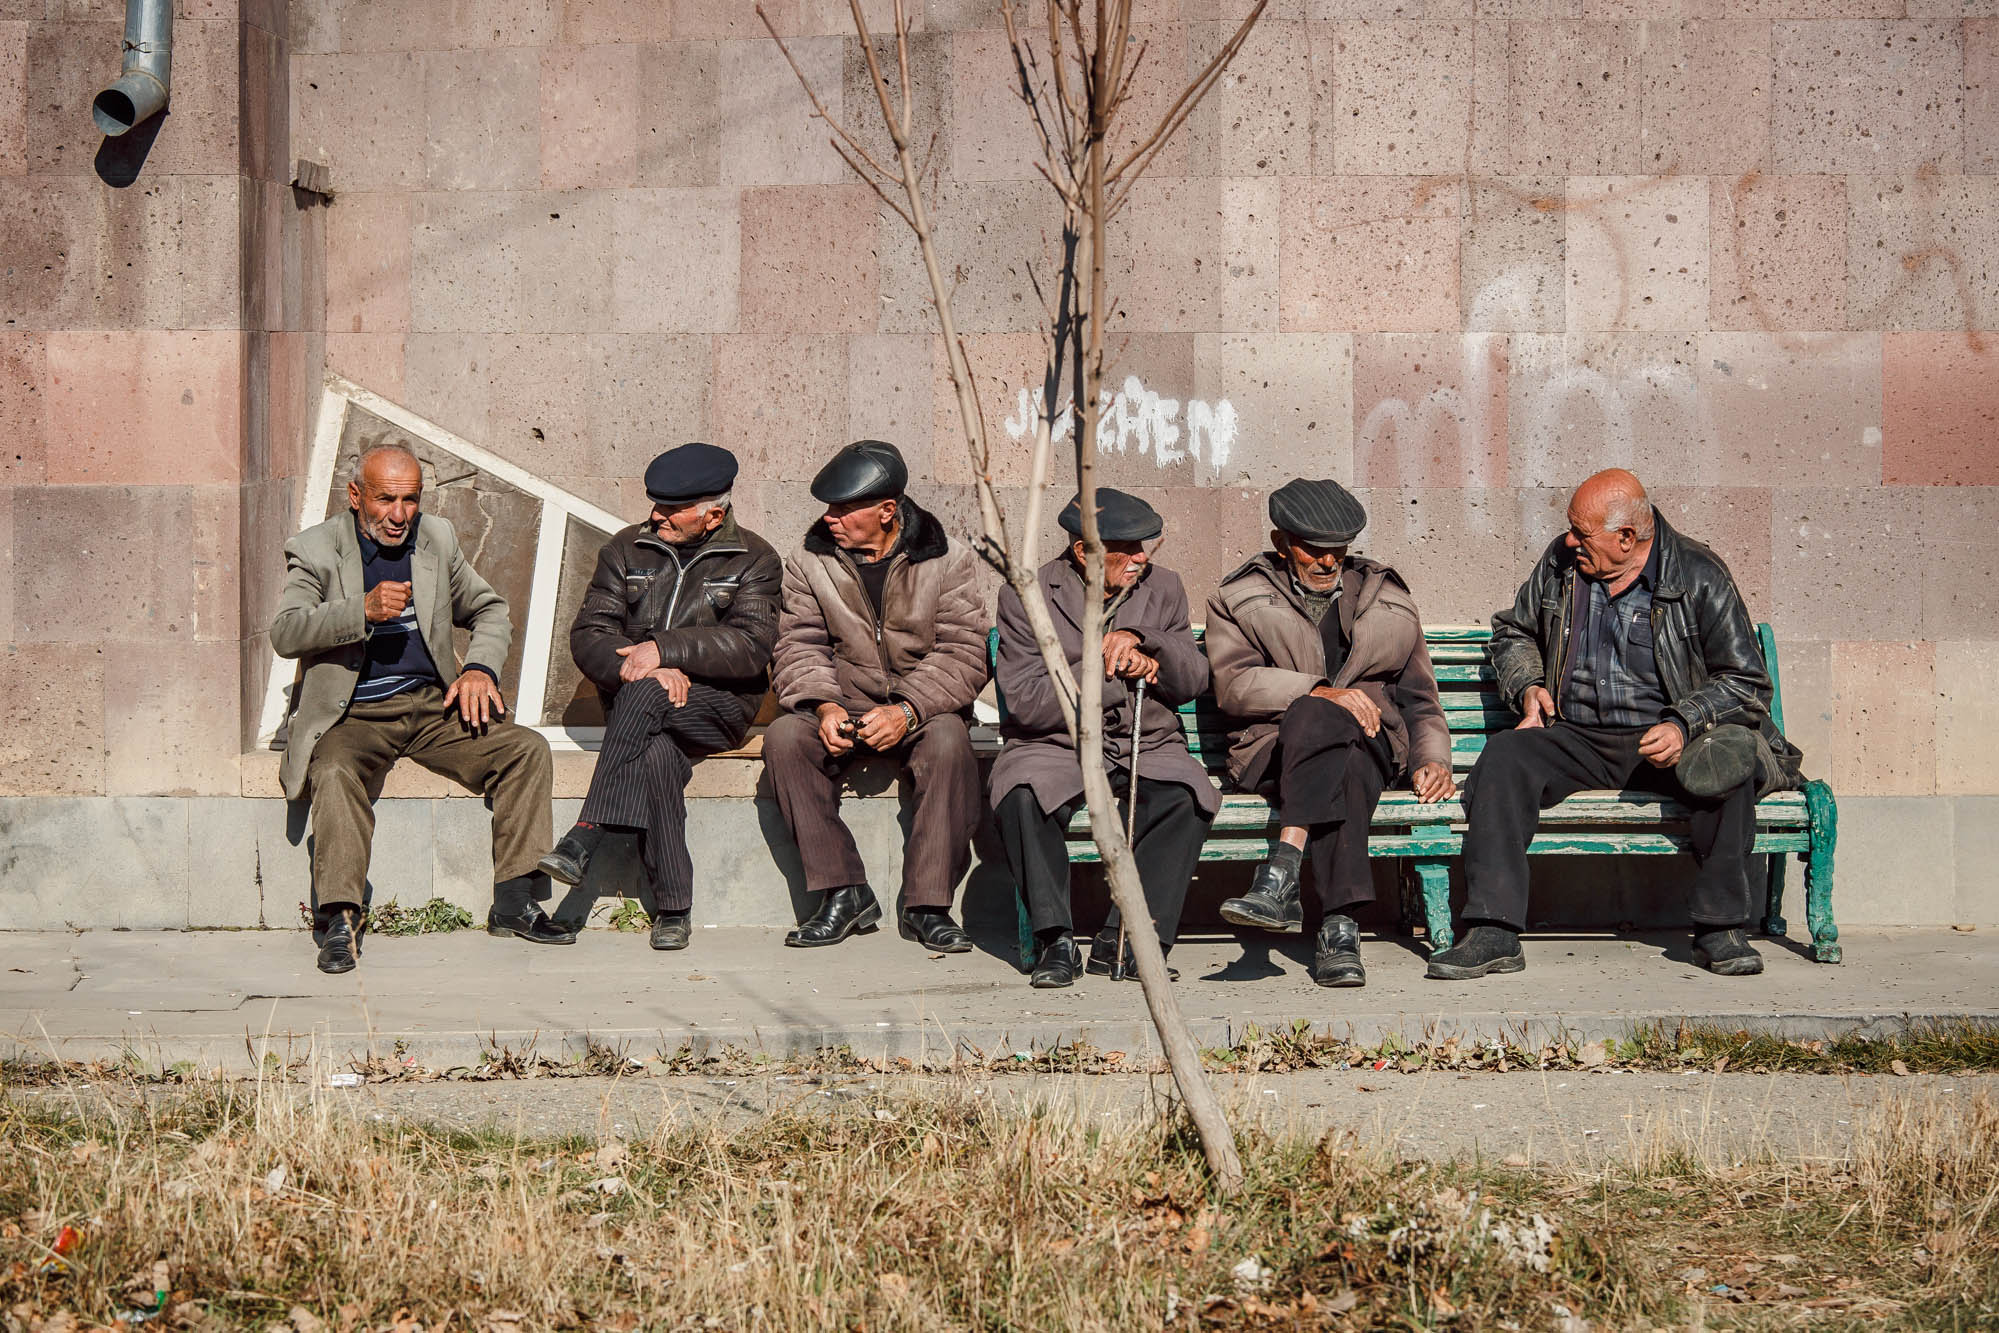 THE ARMENIAN HITCHNAPPING -